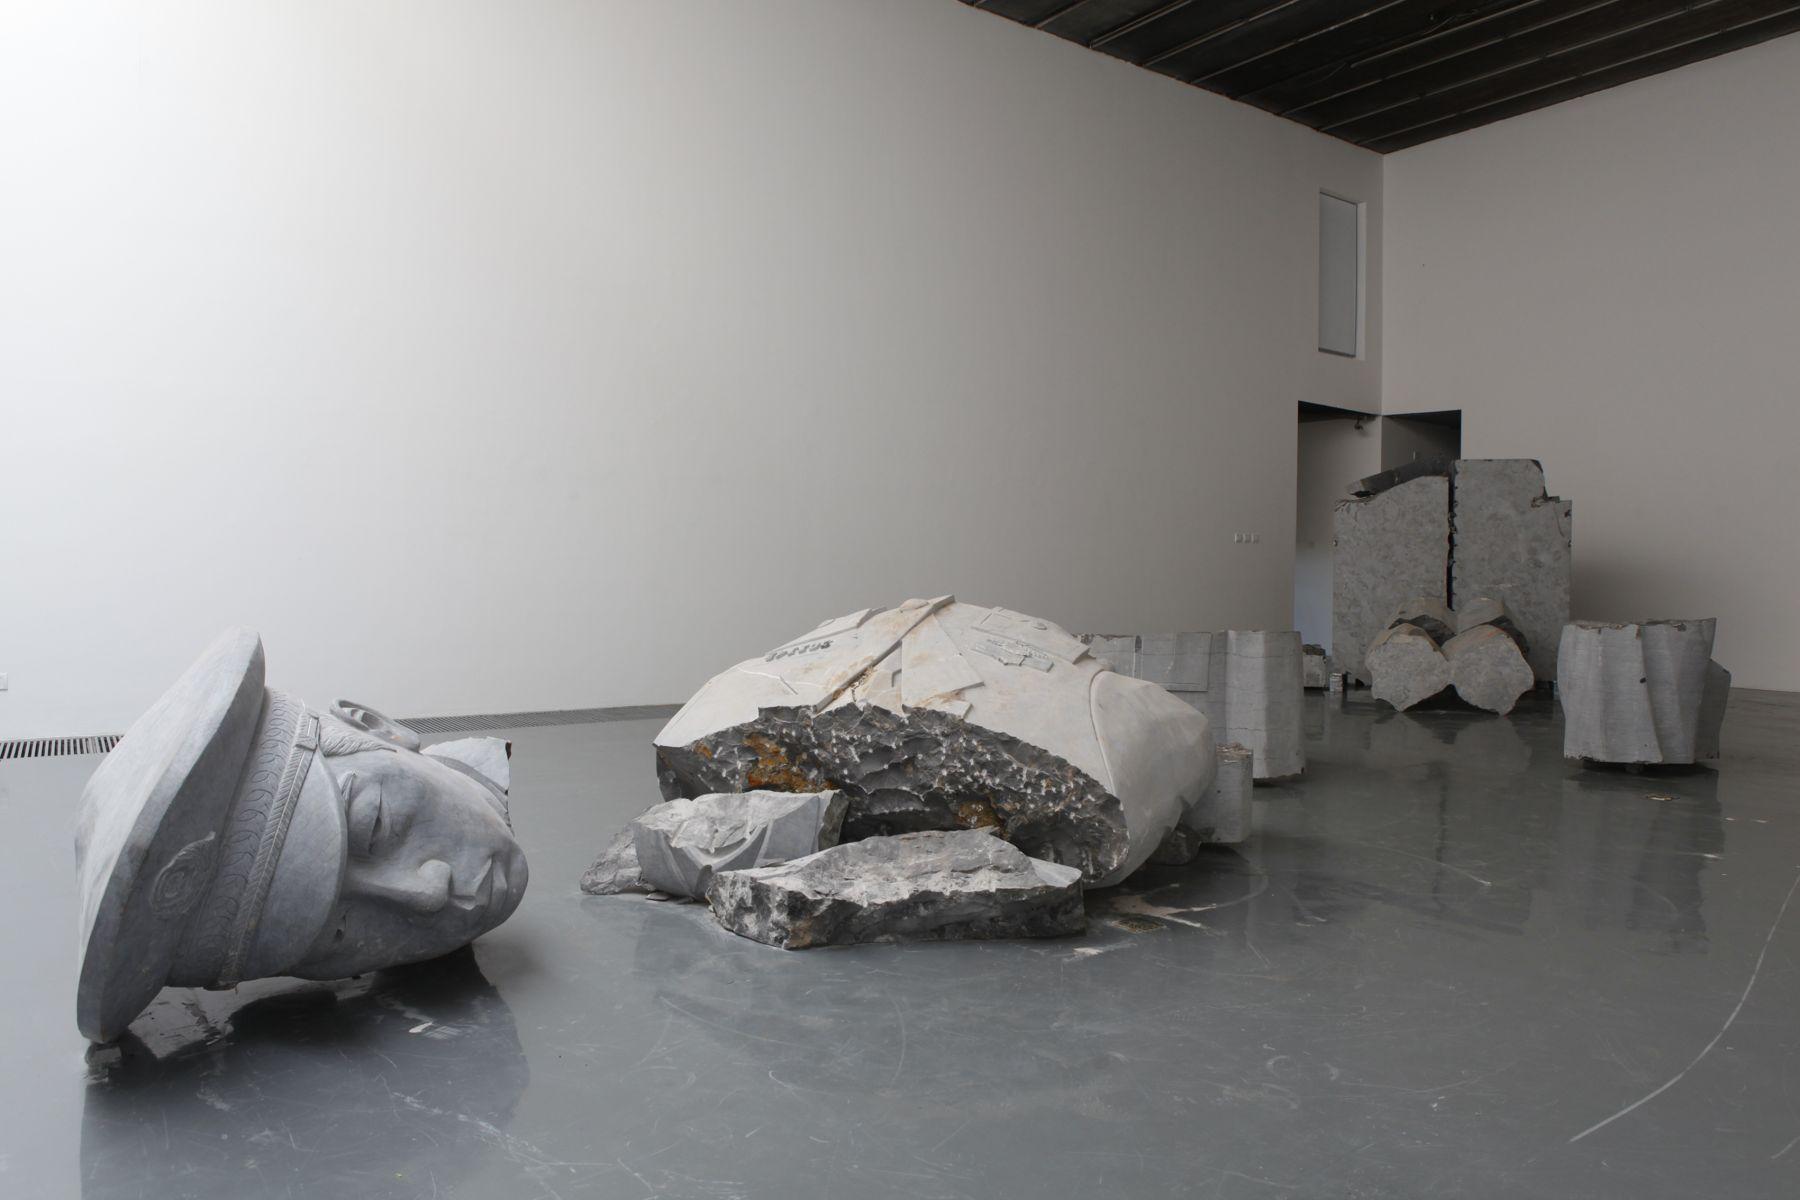 Officerä¼Ÿåƒ, 2011